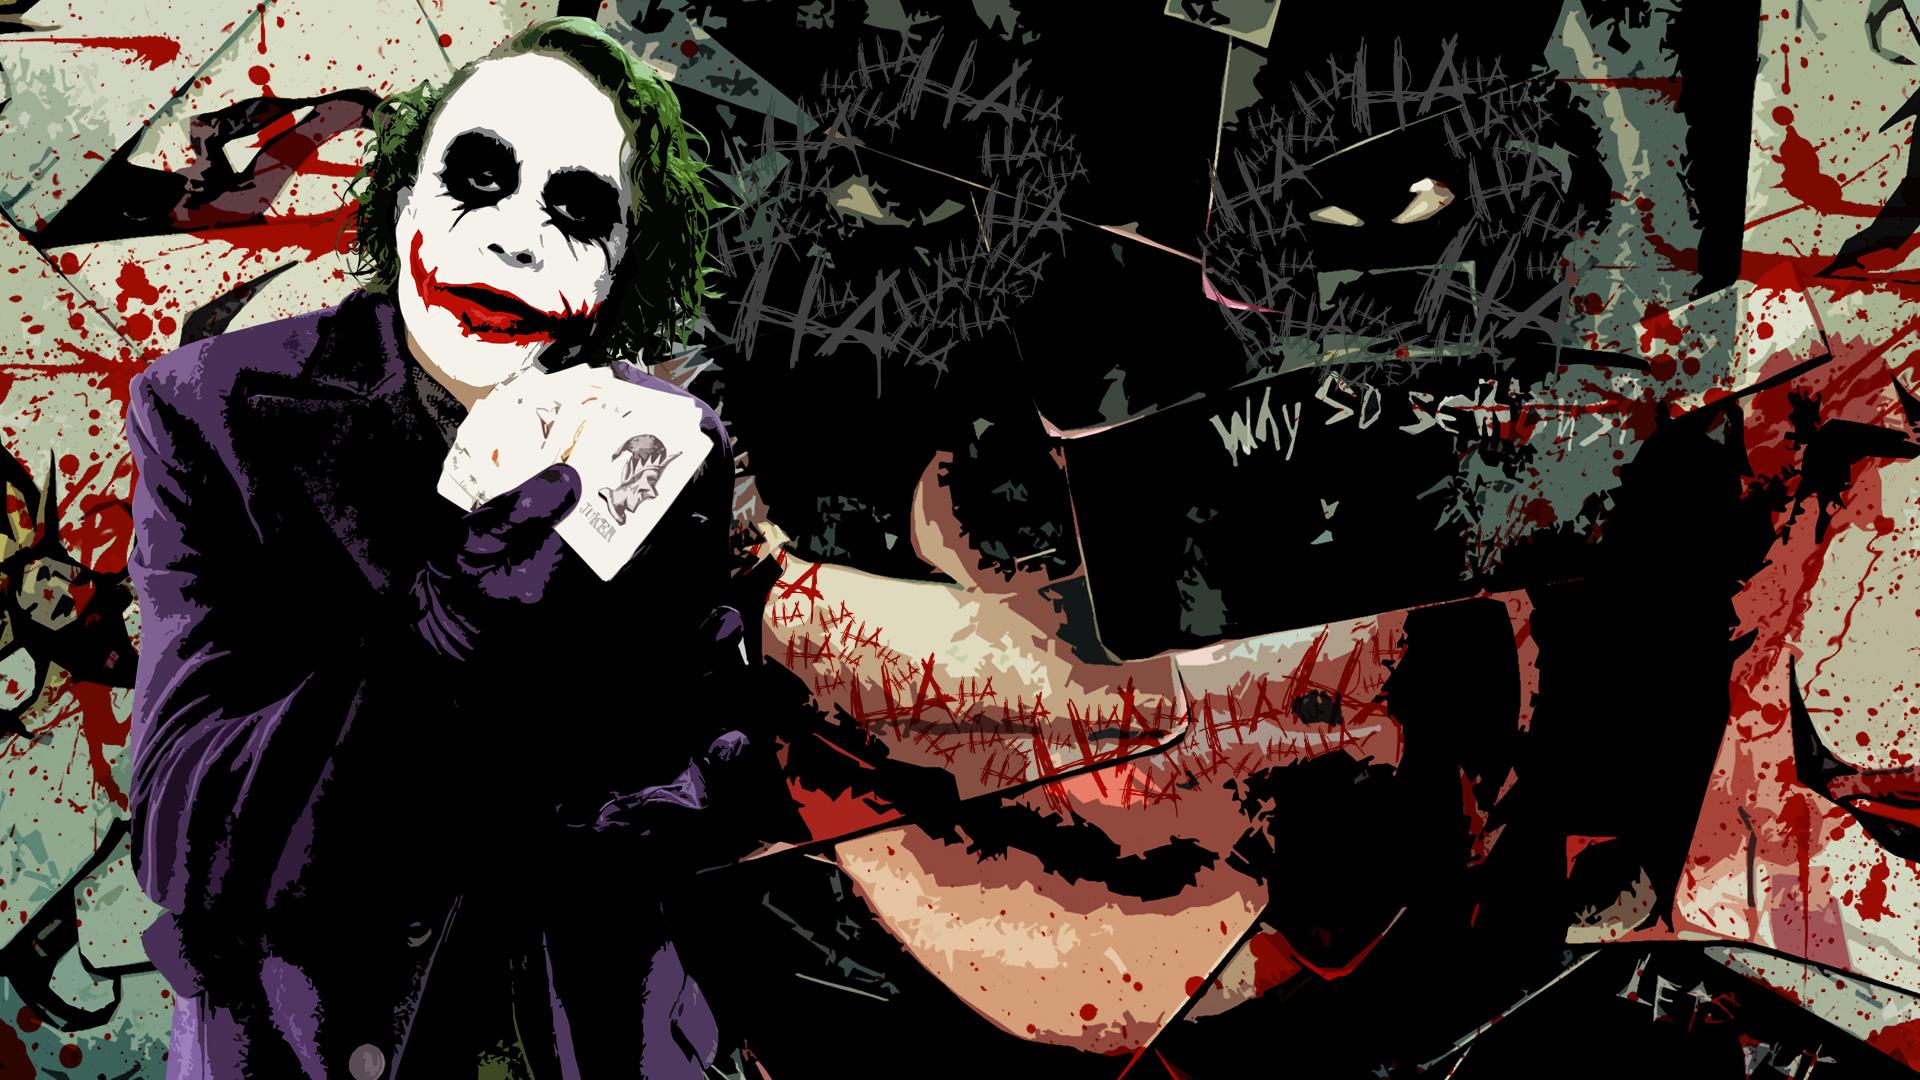 13169 download wallpaper Cinema, Batman, Joker screensavers and pictures for free